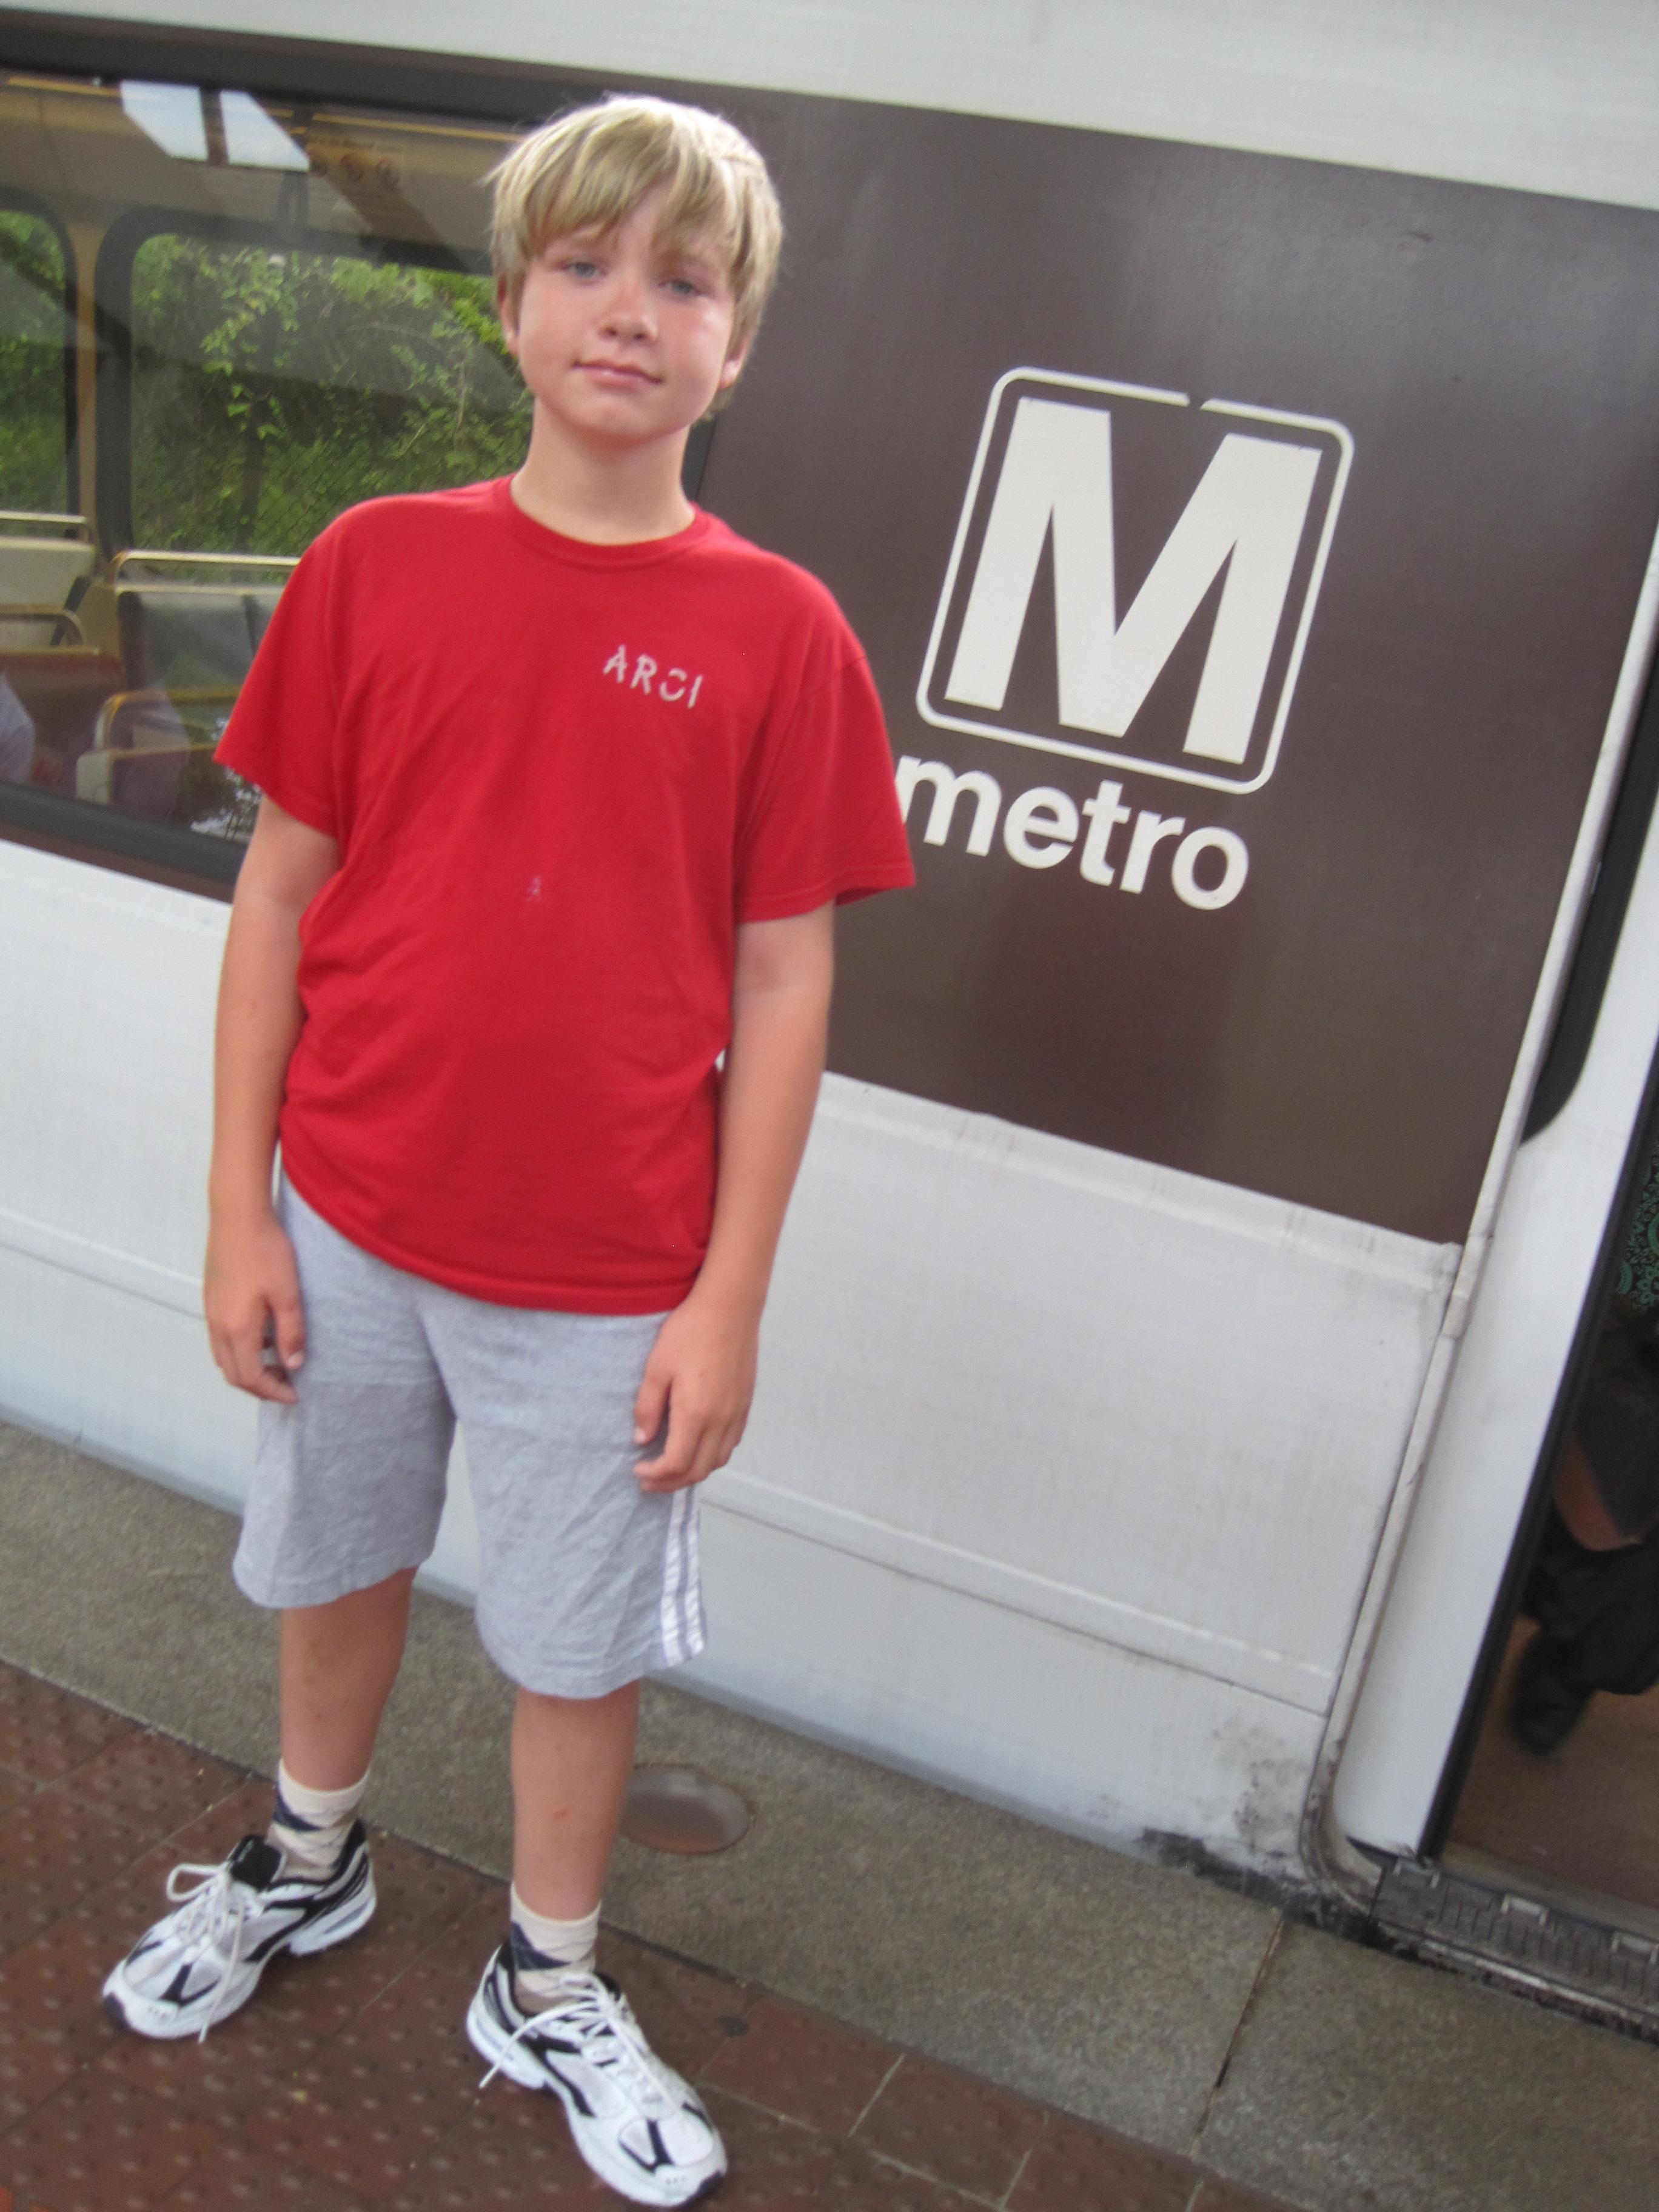 DM metro